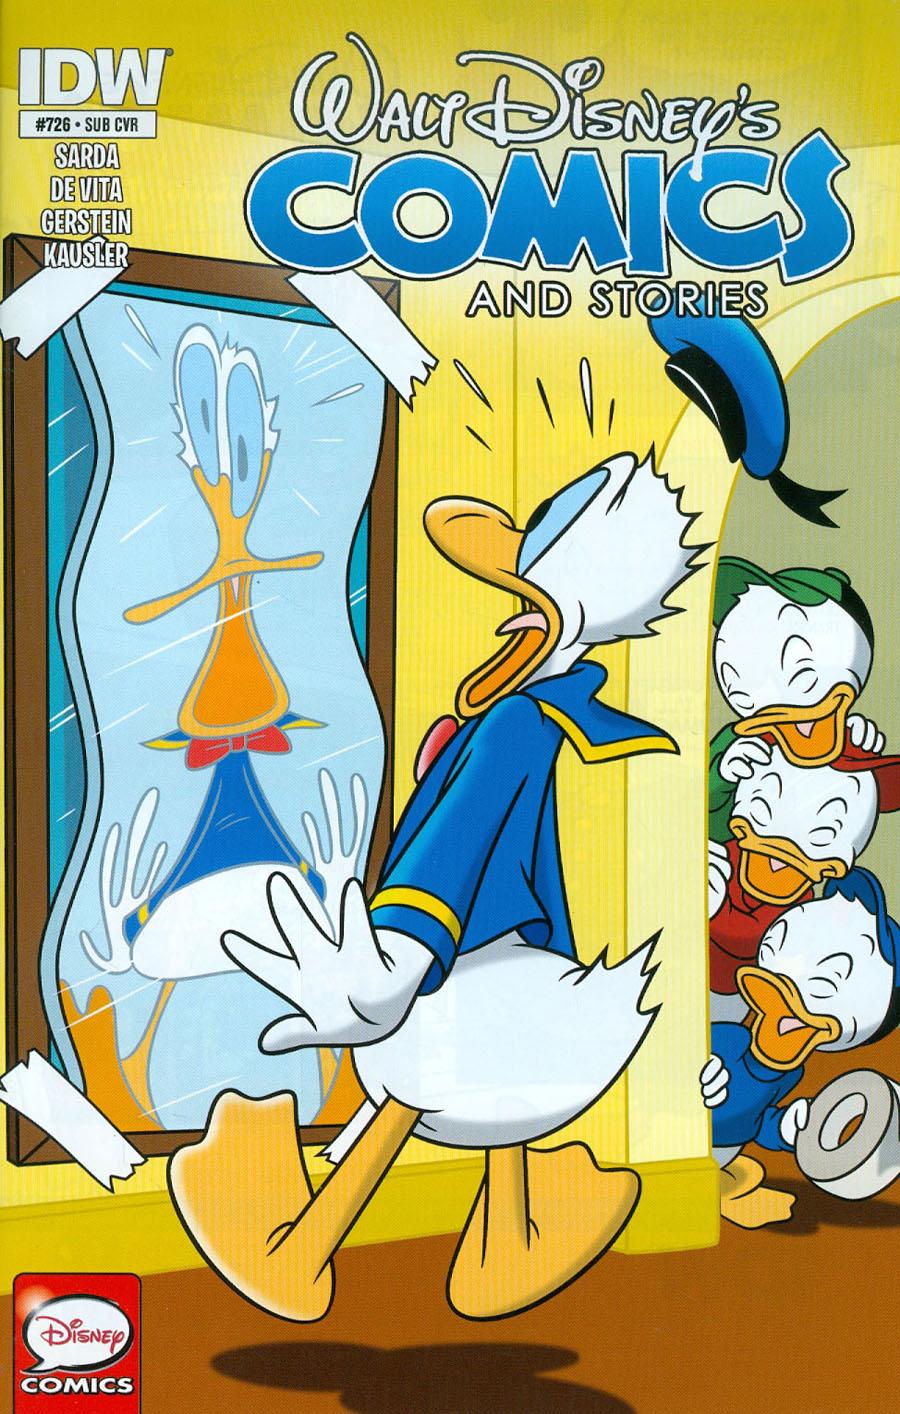 Walt Disneys Comics & Stories #726 Cover B Variant John Loter Subscription Cover